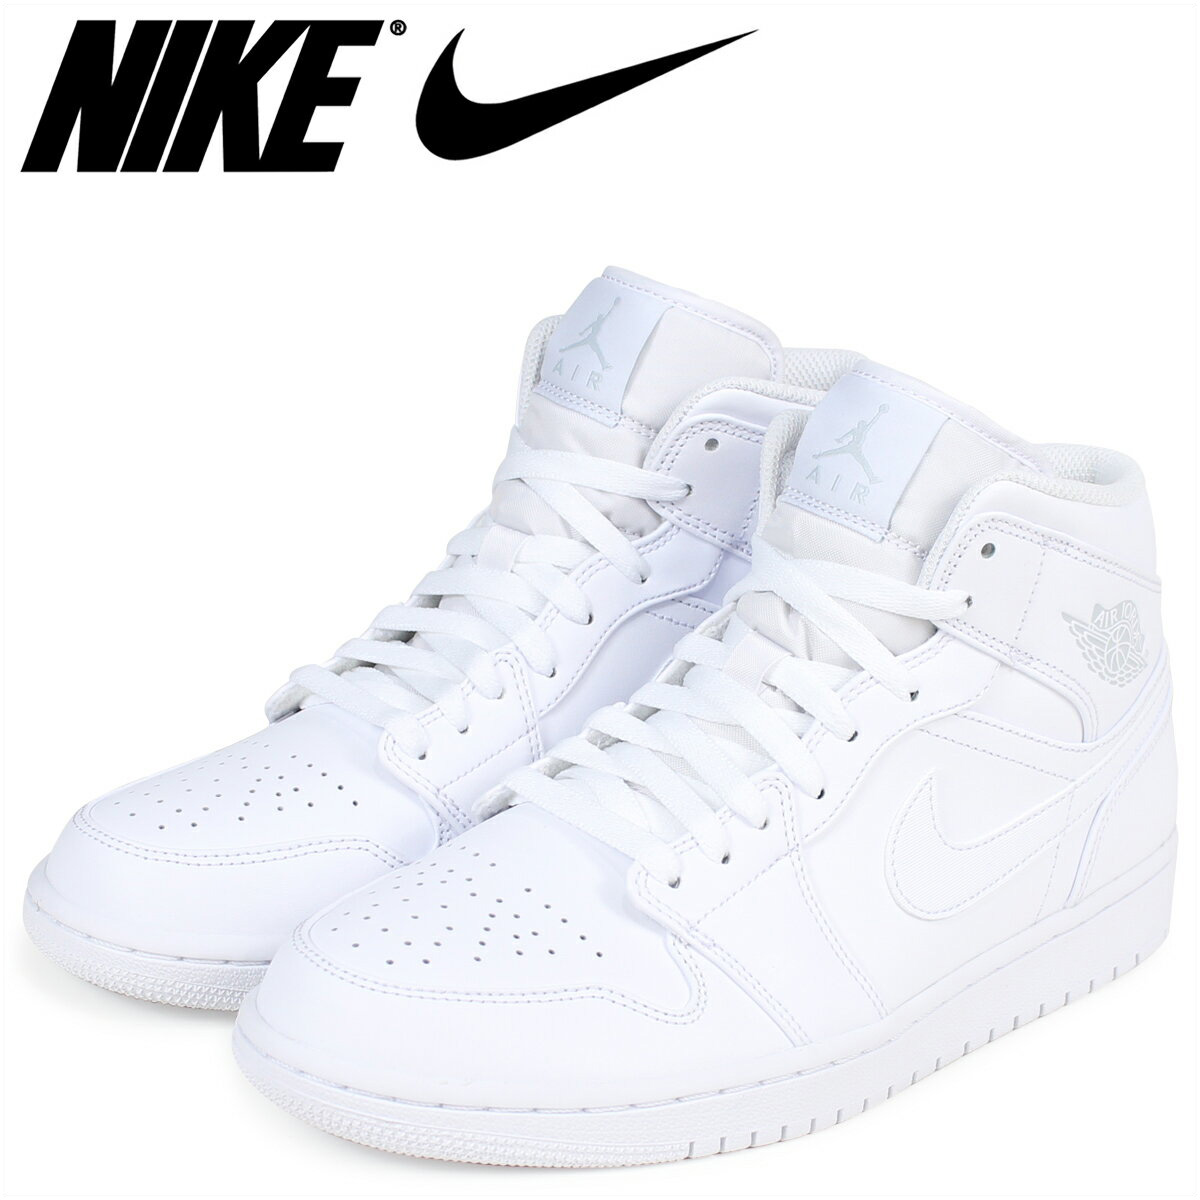 brand new 550dc 6280c NIKE Nike Air Jordan 1 sneakers AIR JORDAN 1 MID 554,724-104 men's shoes  white white